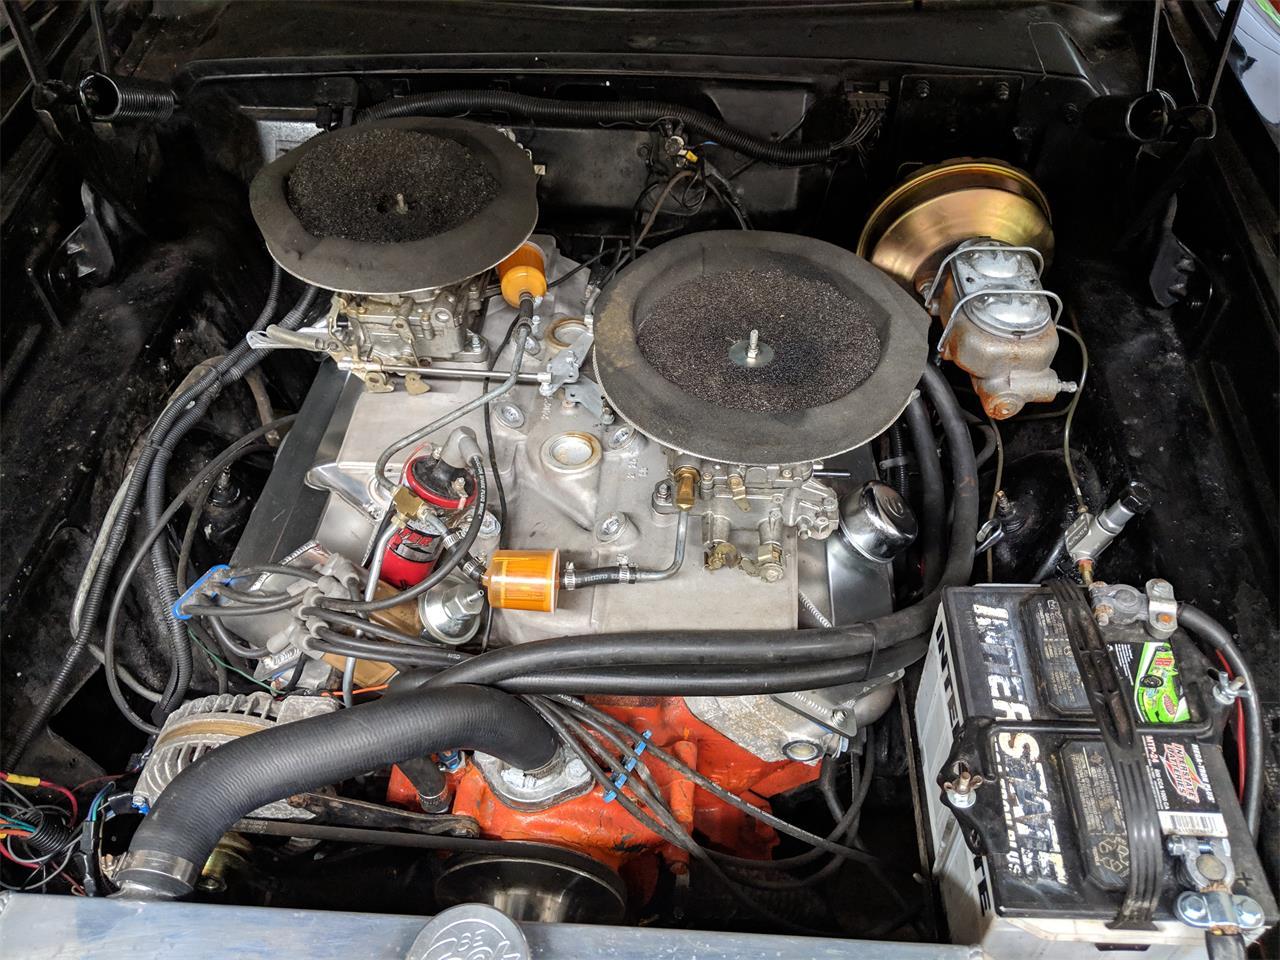 Large Picture of Classic '64 Dodge Polara located in Elkton Maryland - $23,000.00 - Q0ZT